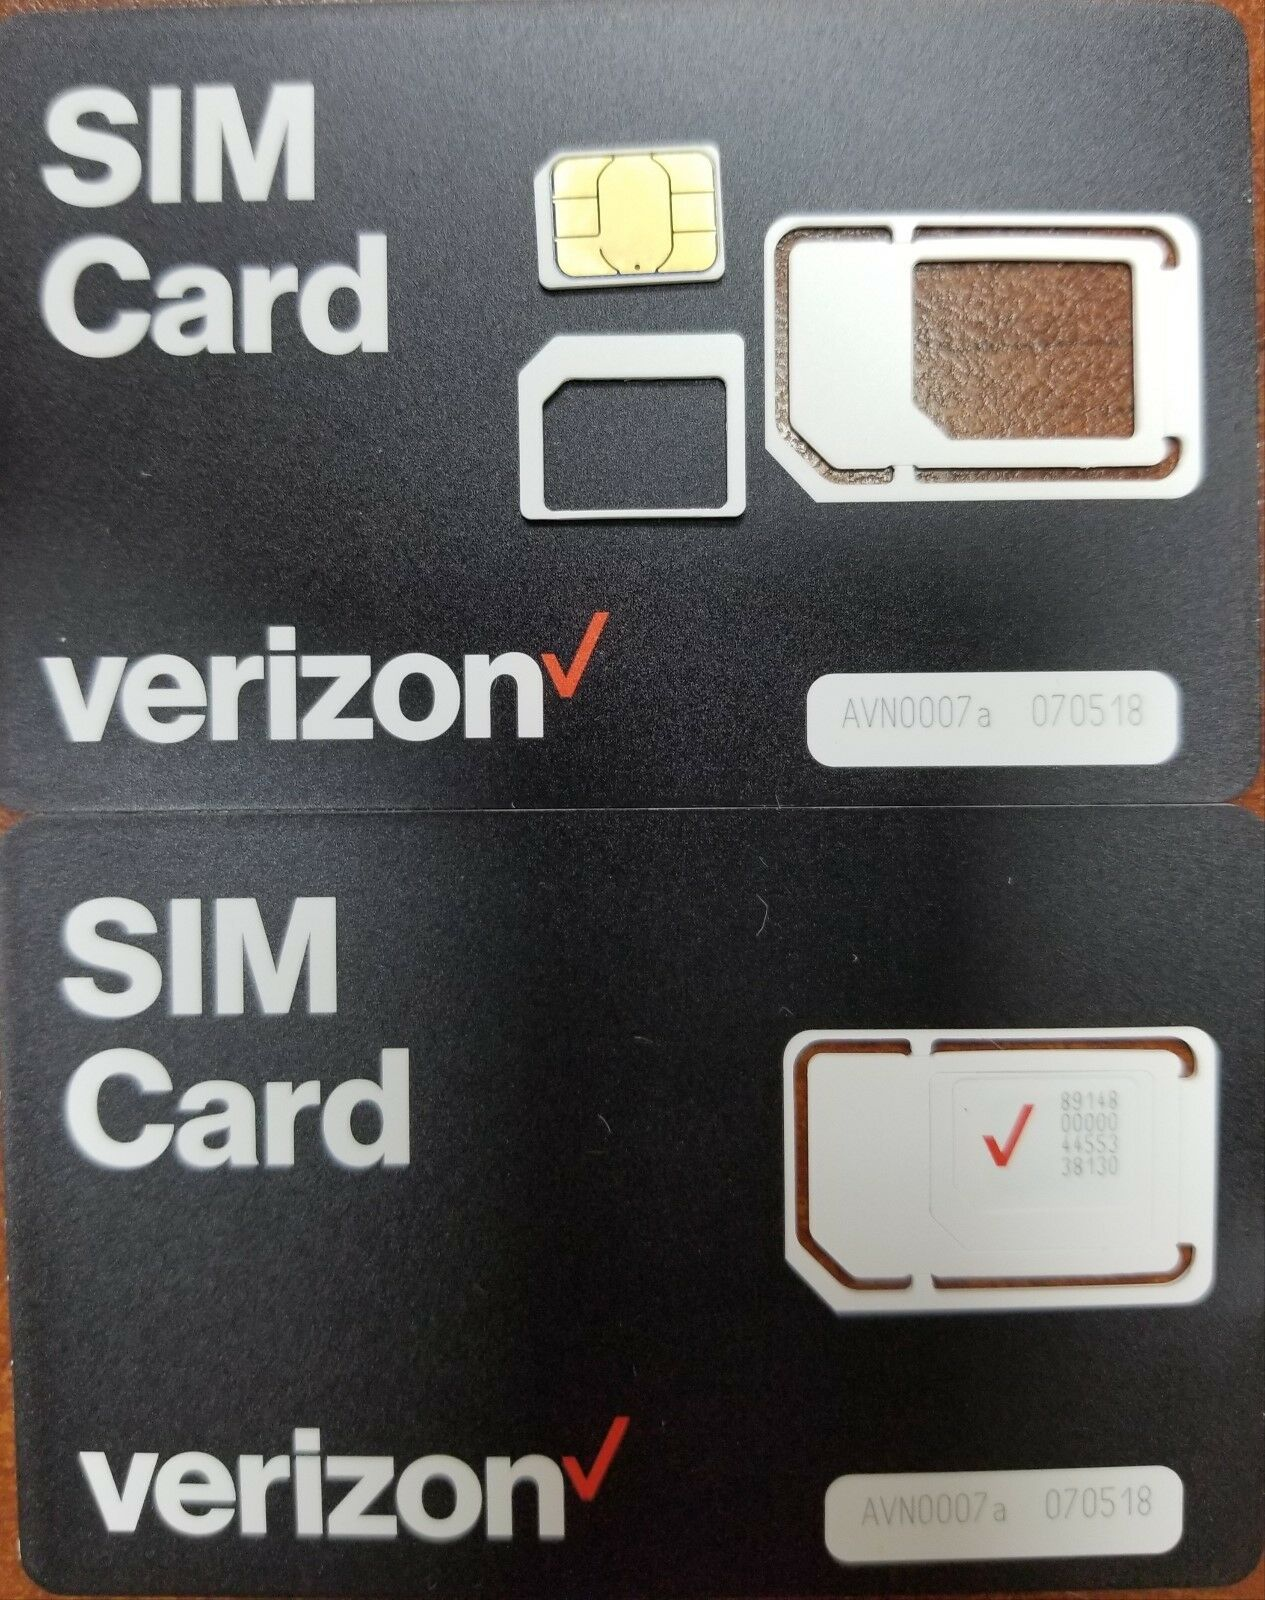 как выглядит VERIZON NANO SIM CARD  NEW 4FF 4G LTE Fits all phones Prepaid/Contract 3 IN 1 фото